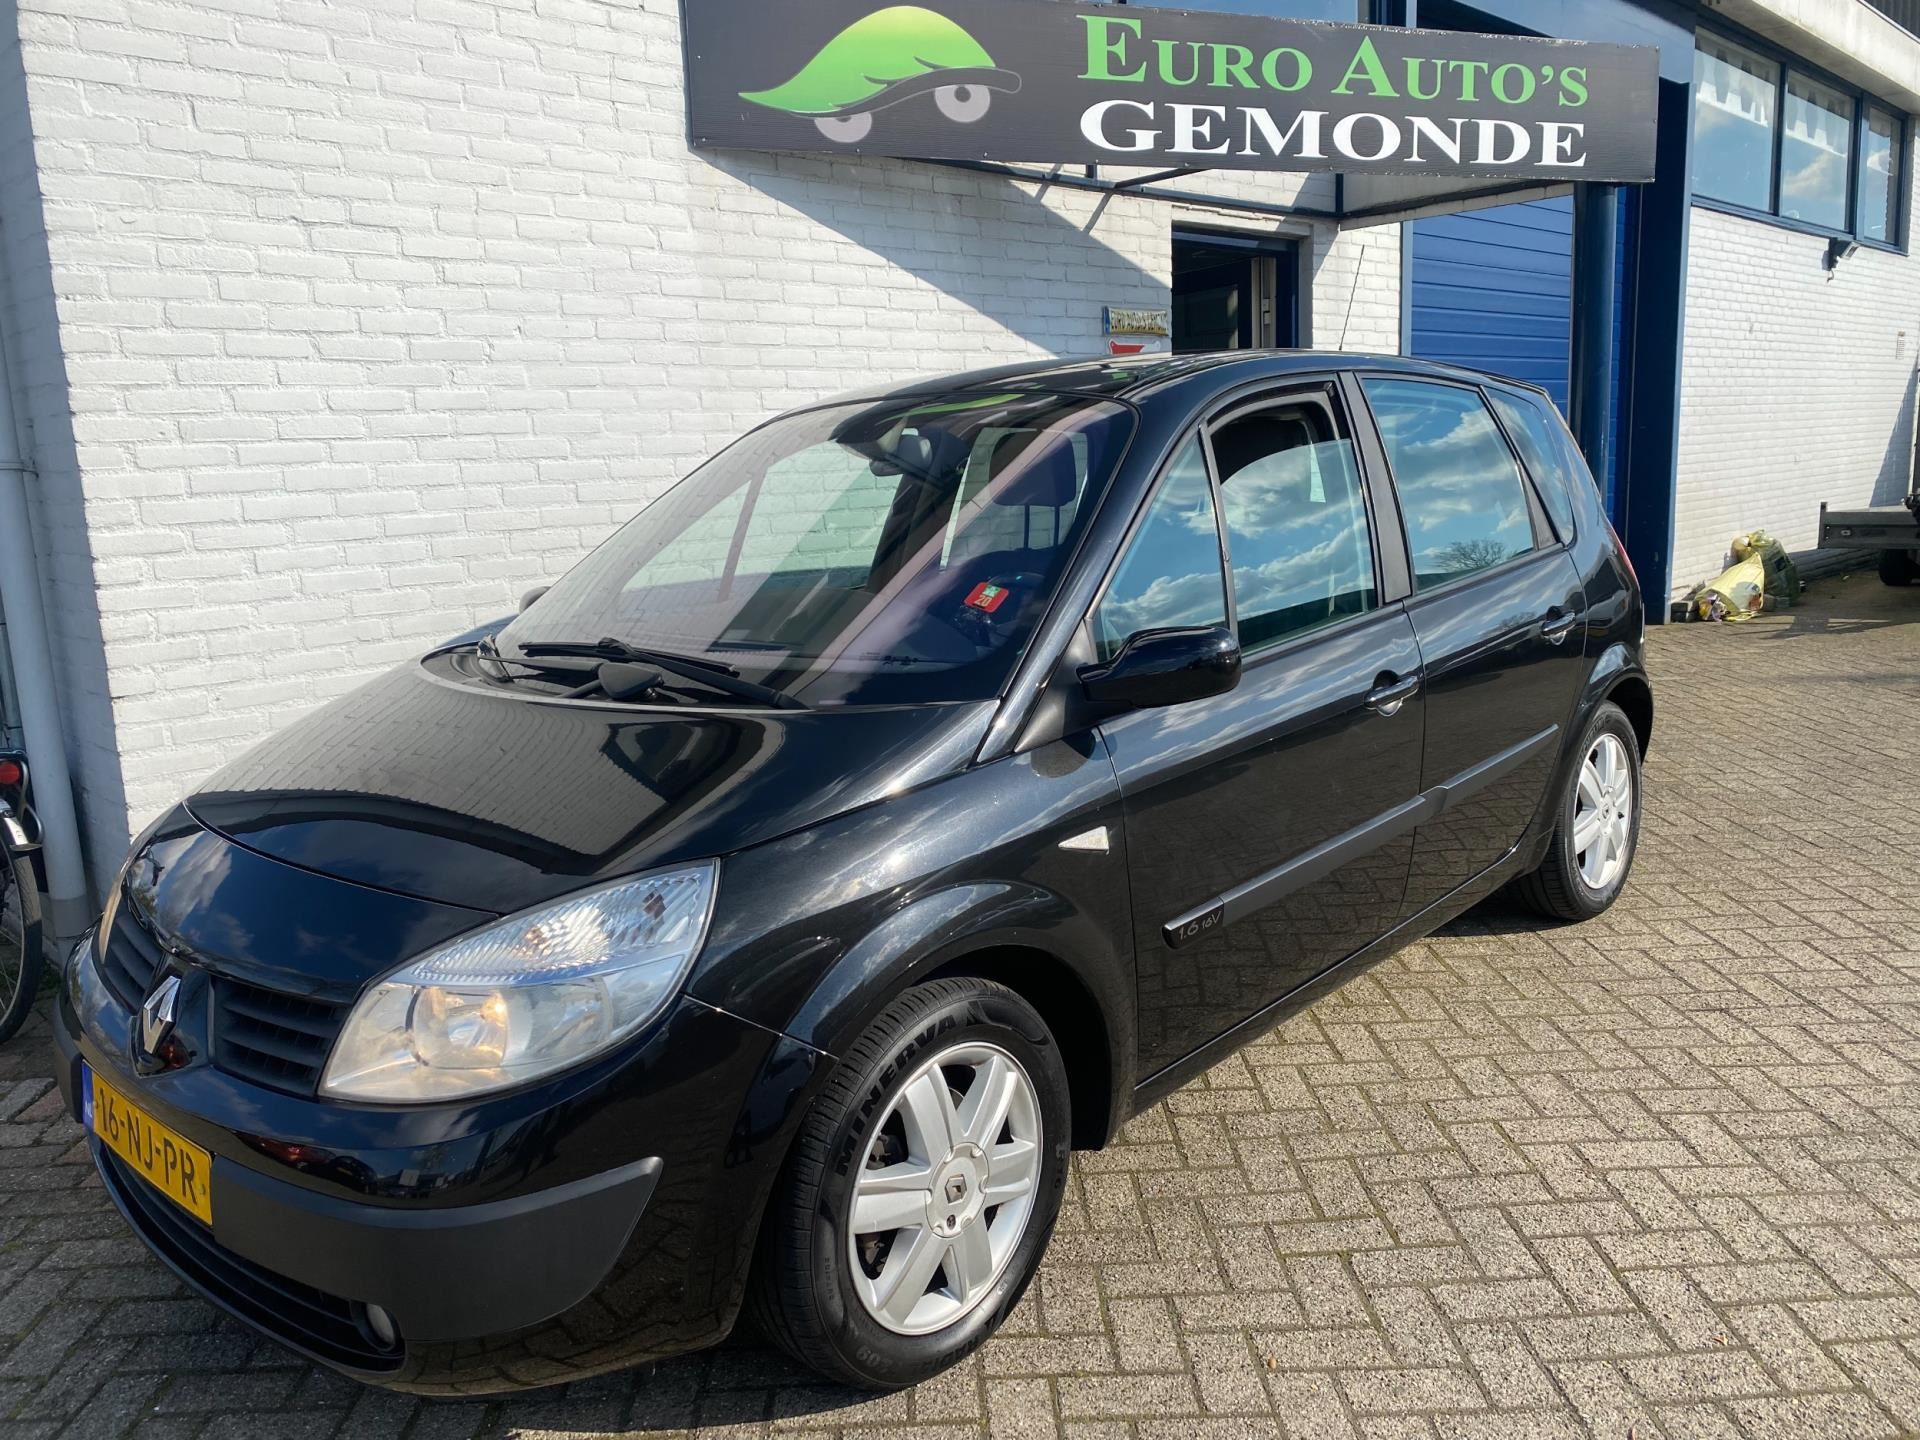 Renault Scénic occasion - Euro Auto's Gemonde